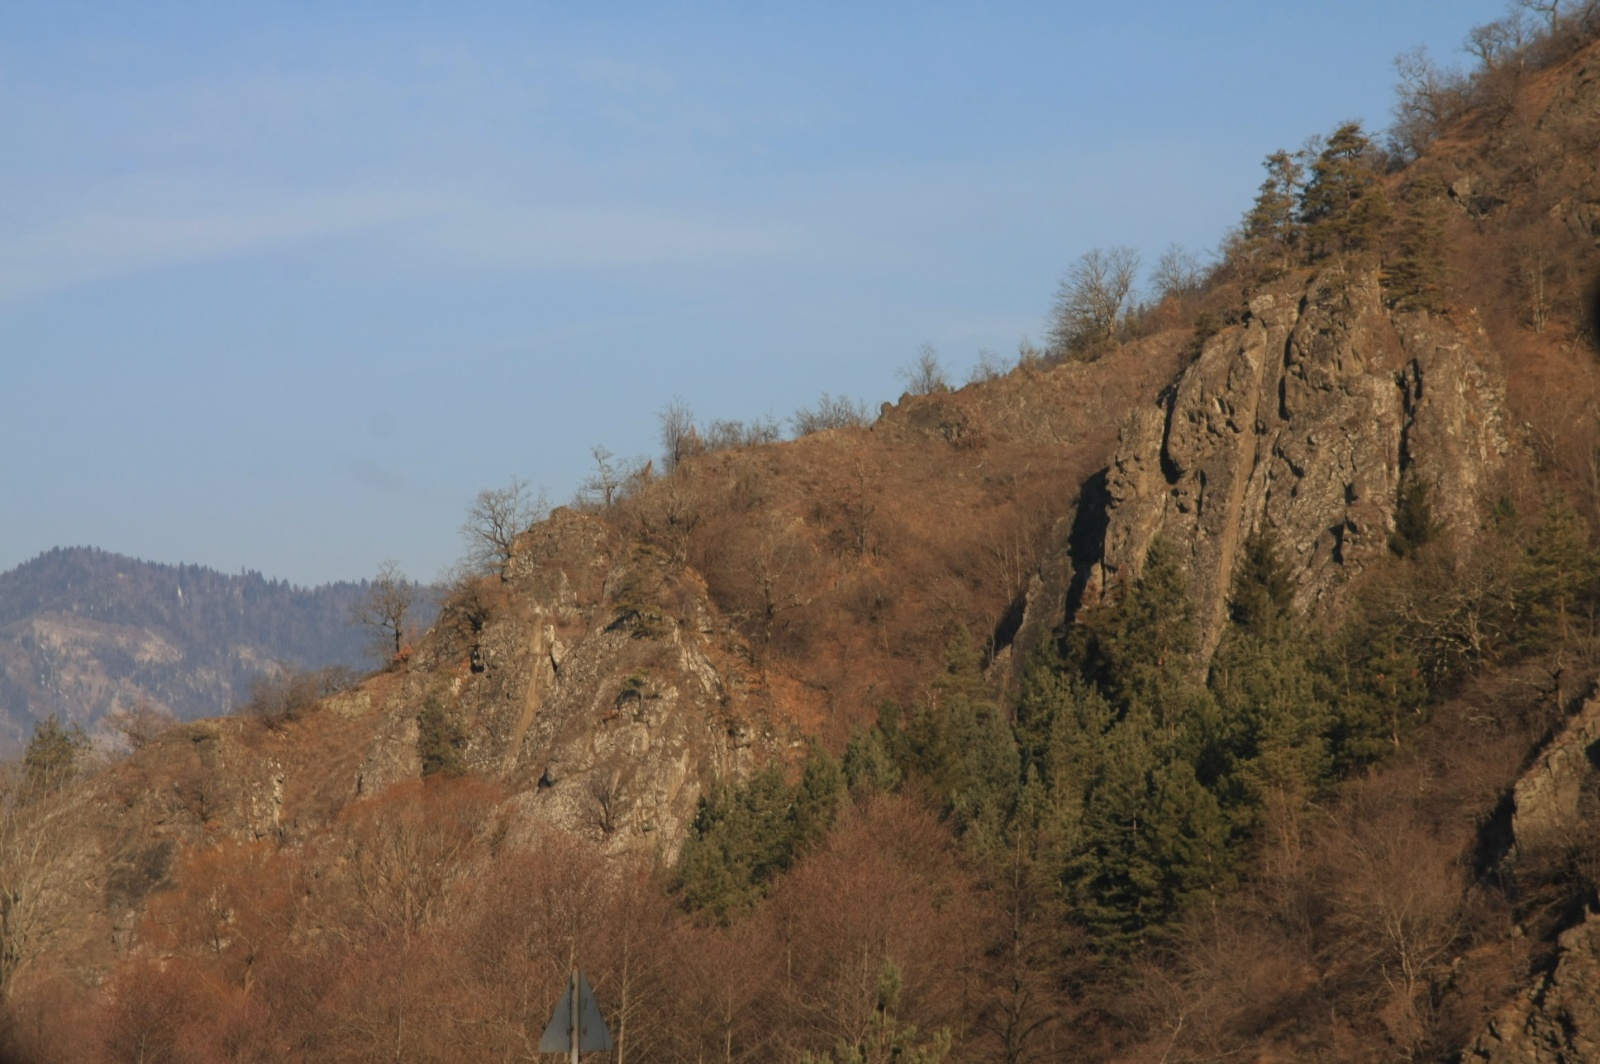 Still no new snow, so we decided to make a day-trip to Vardzia